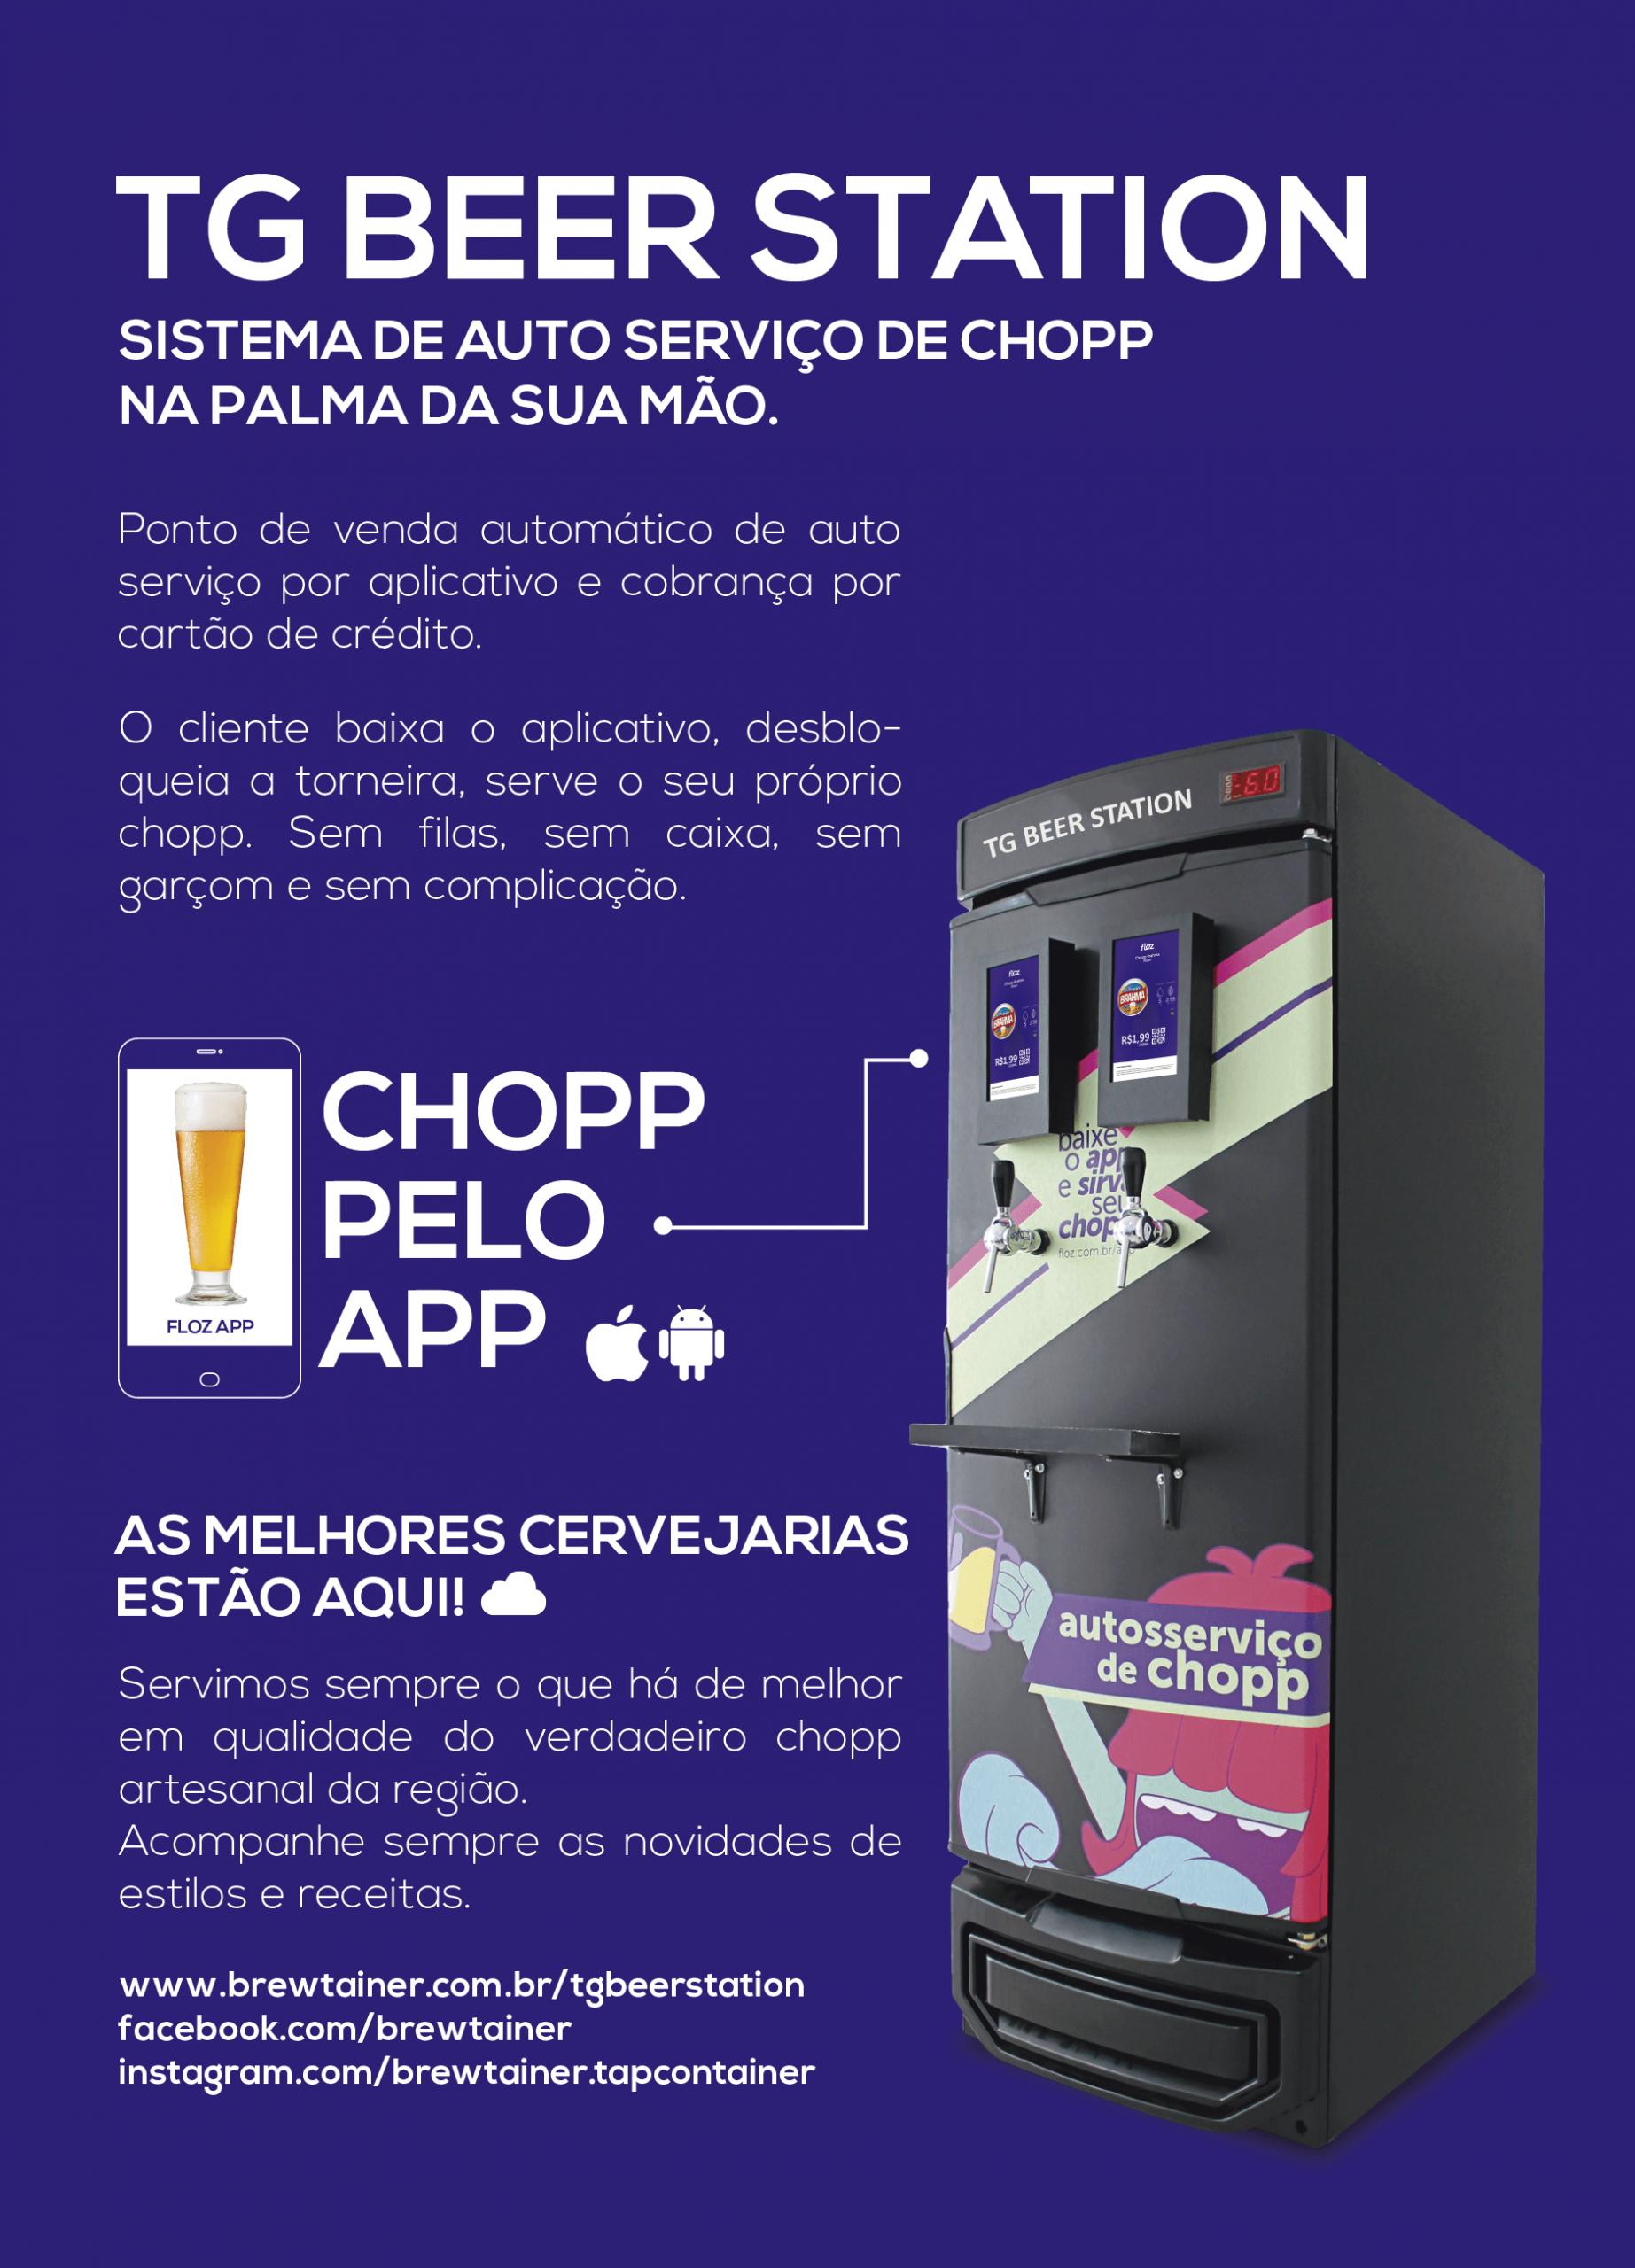 Sistema de Auto Serviço de Chopp - TG BEER STATION